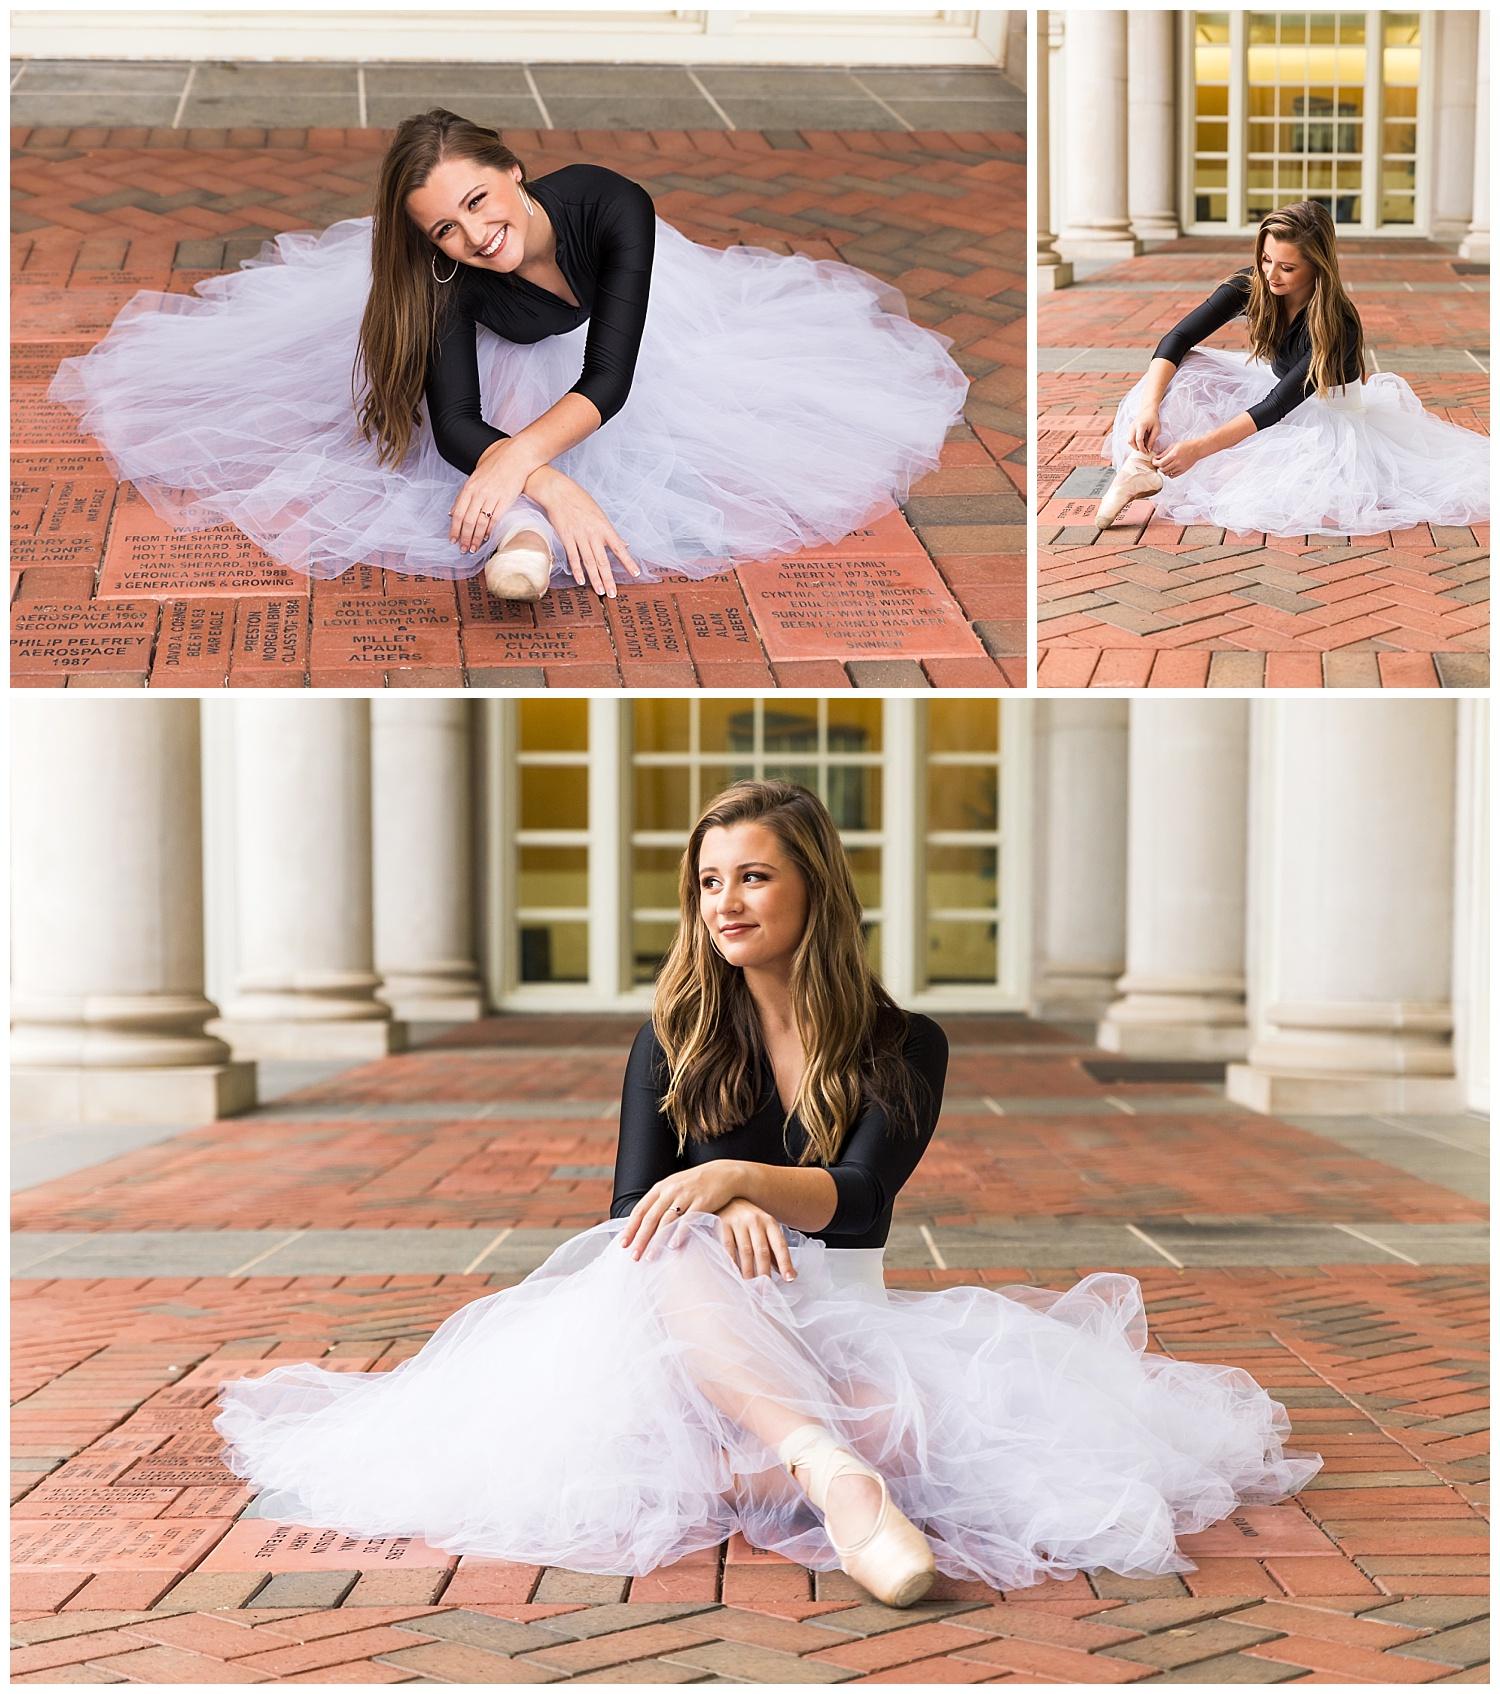 pointe ballet senior portraits dance photo session auburn alabama lauren beesley photography